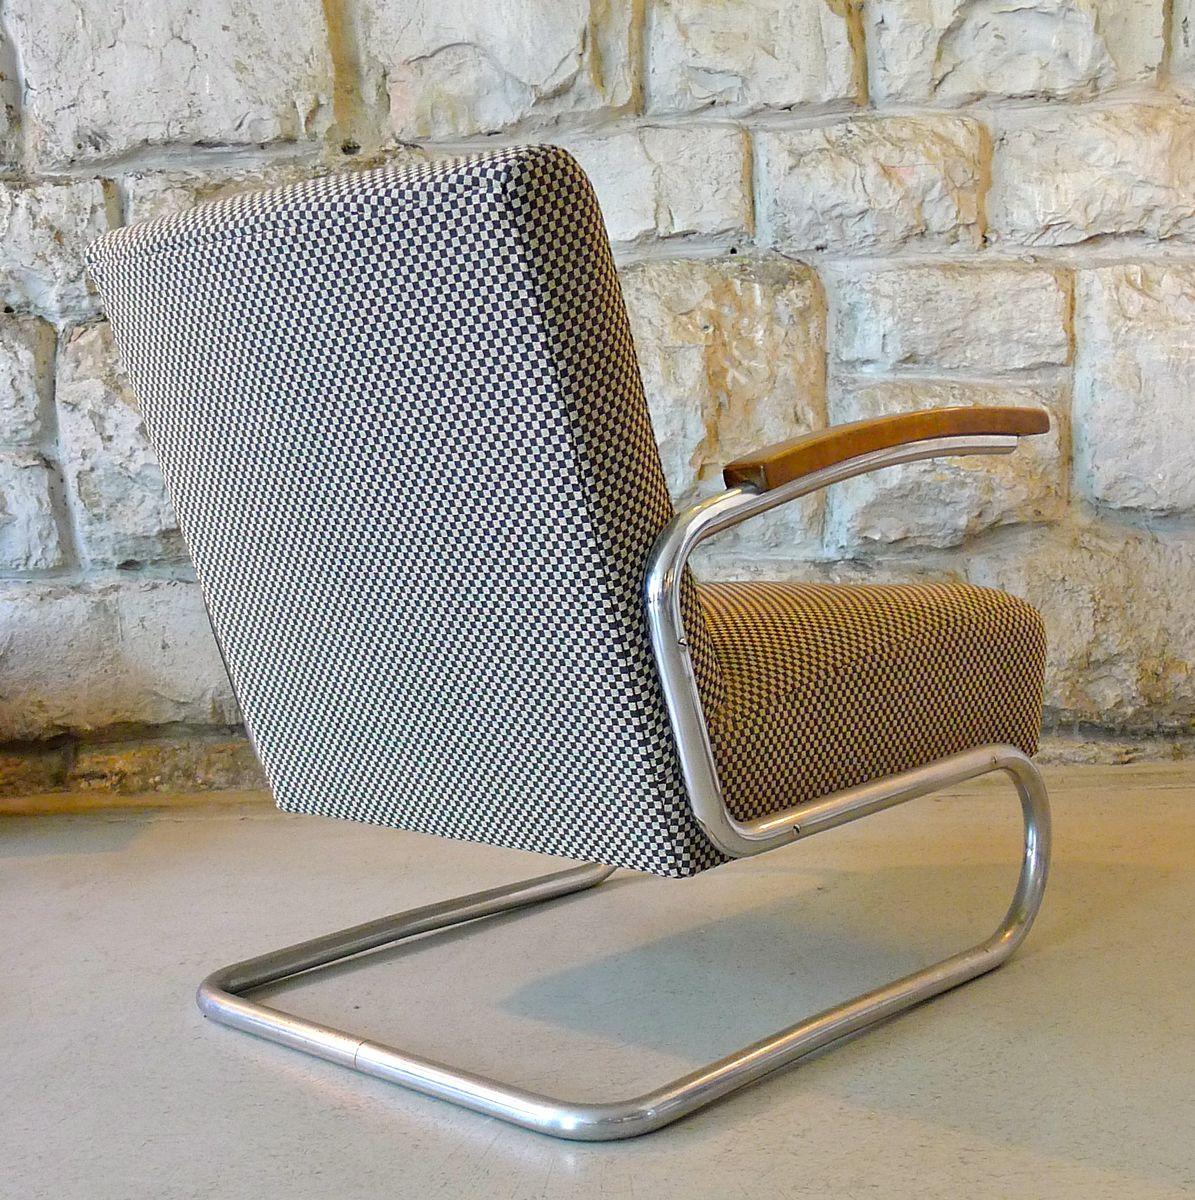 stahlrohr sessel 1930er bei pamono kaufen. Black Bedroom Furniture Sets. Home Design Ideas